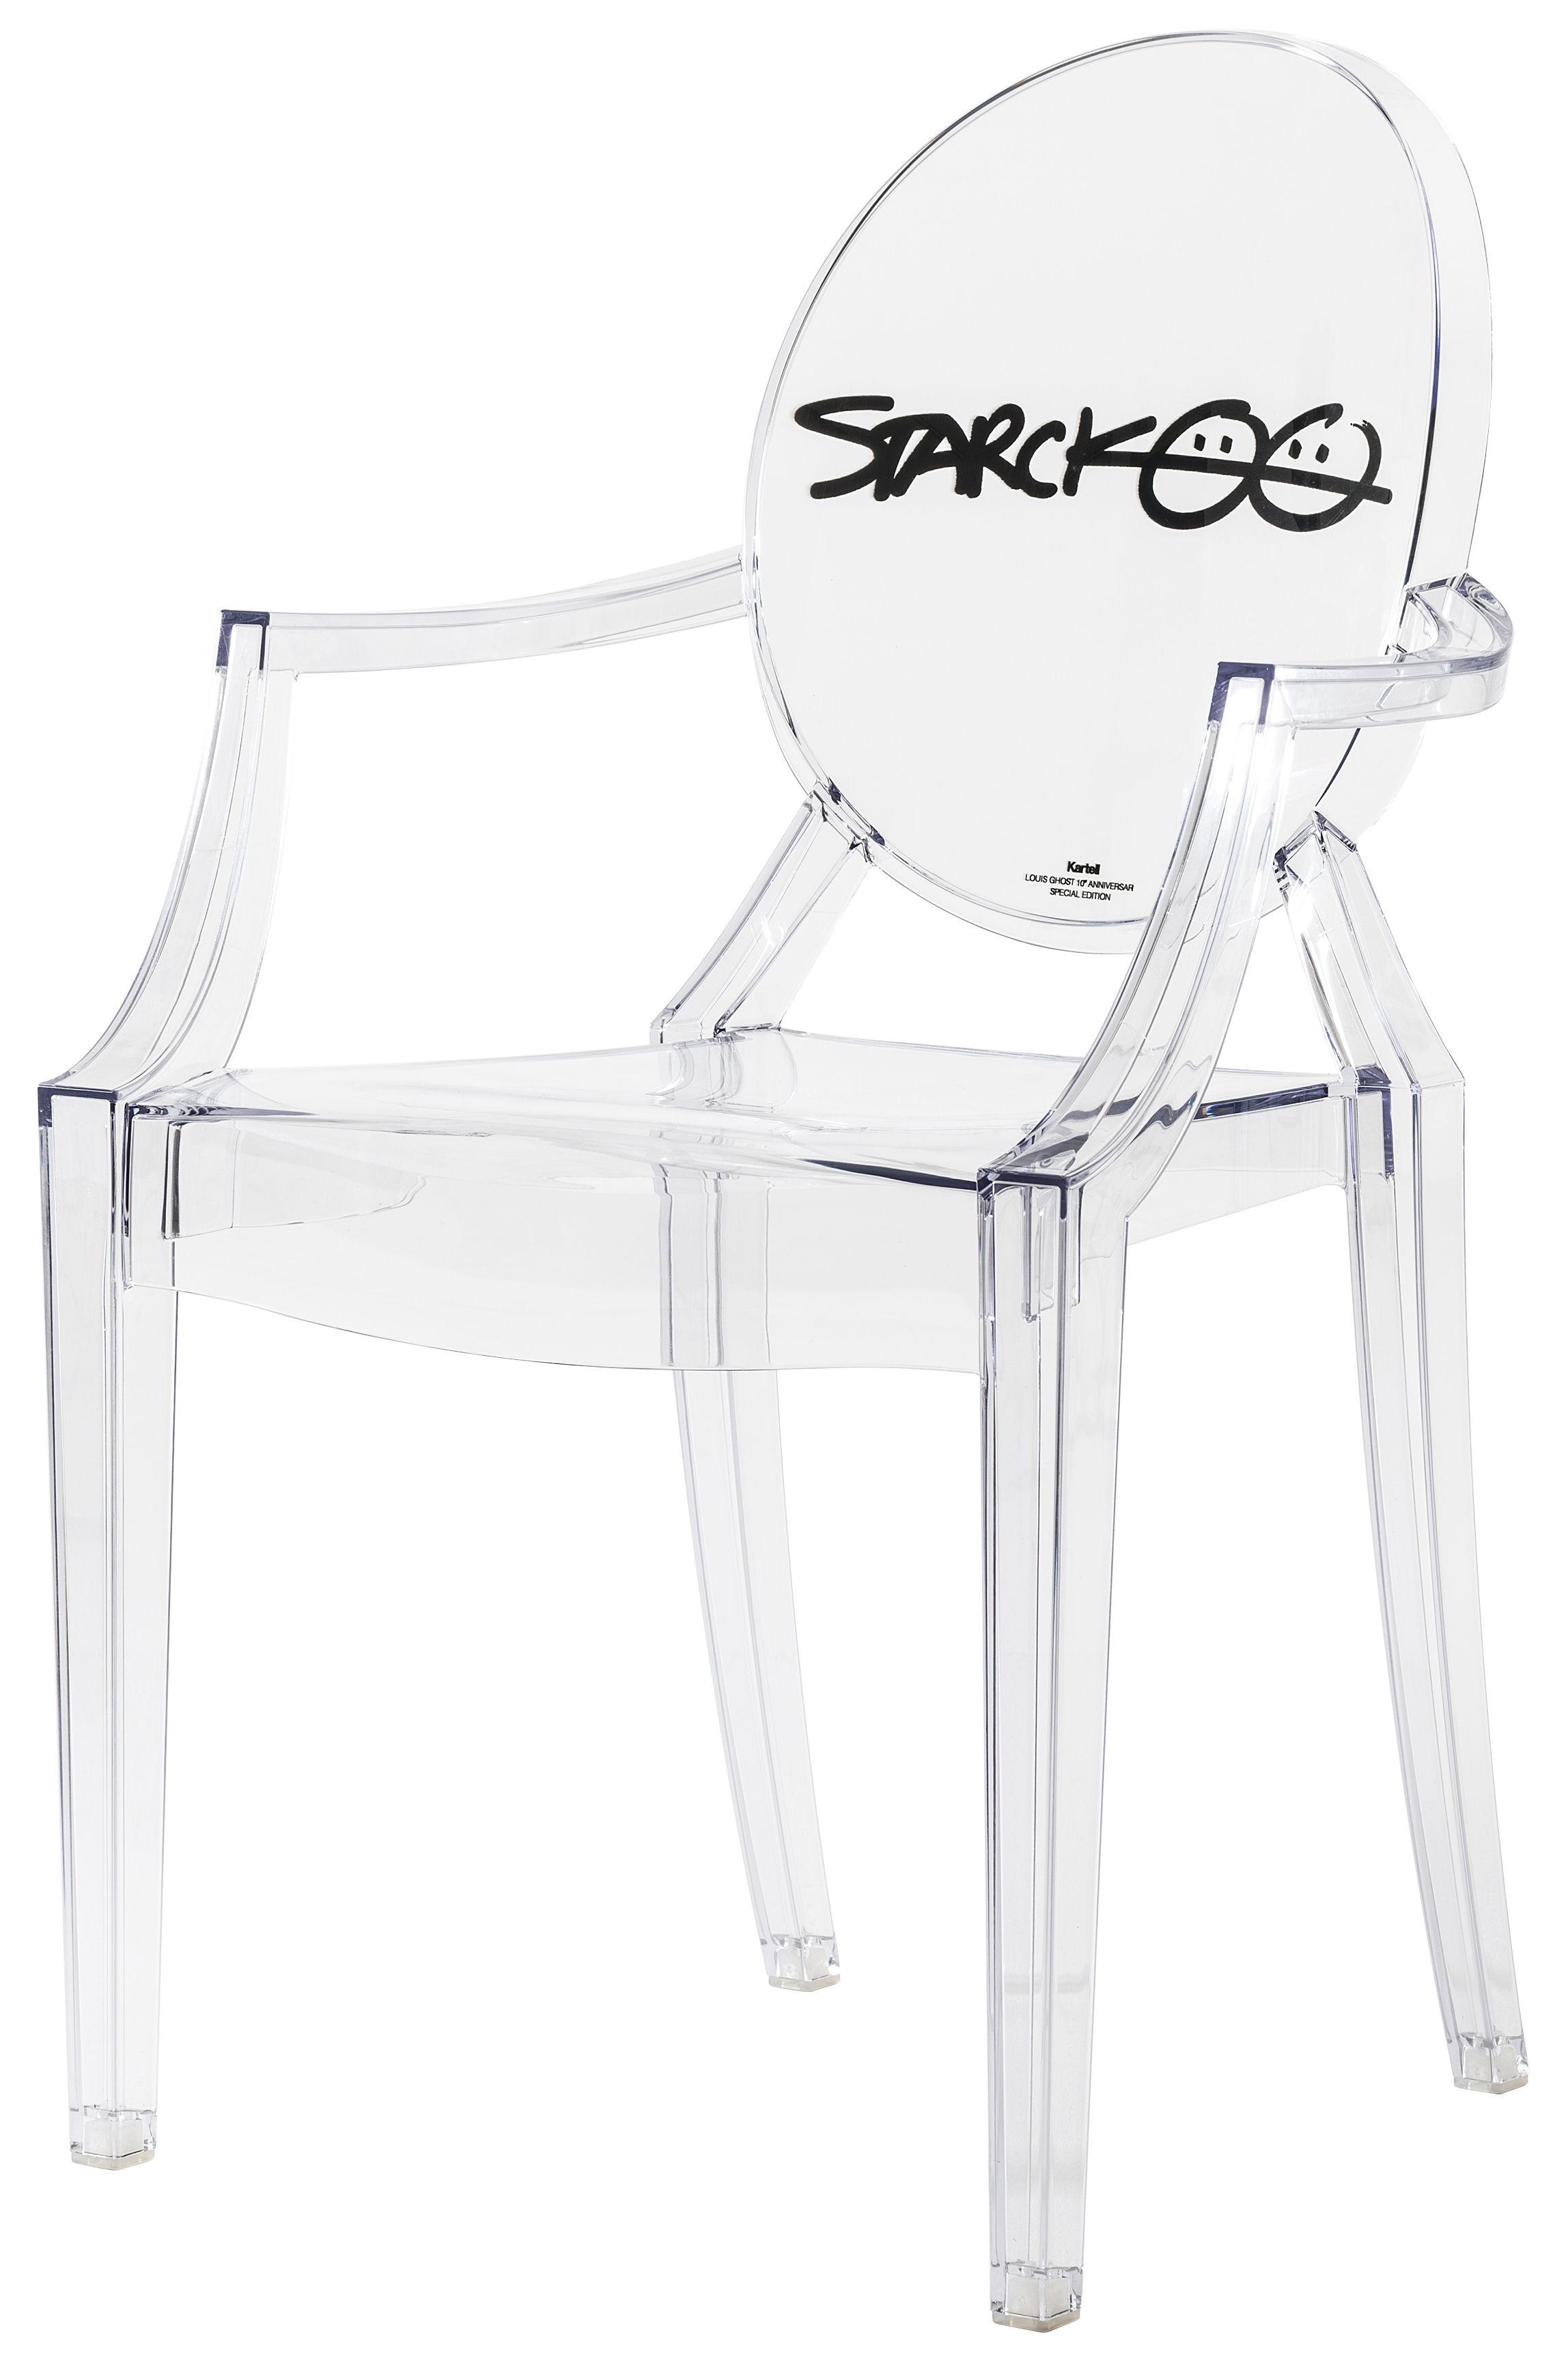 fauteuil empilable louis ghost collector transparent signature starck cristal signature de. Black Bedroom Furniture Sets. Home Design Ideas